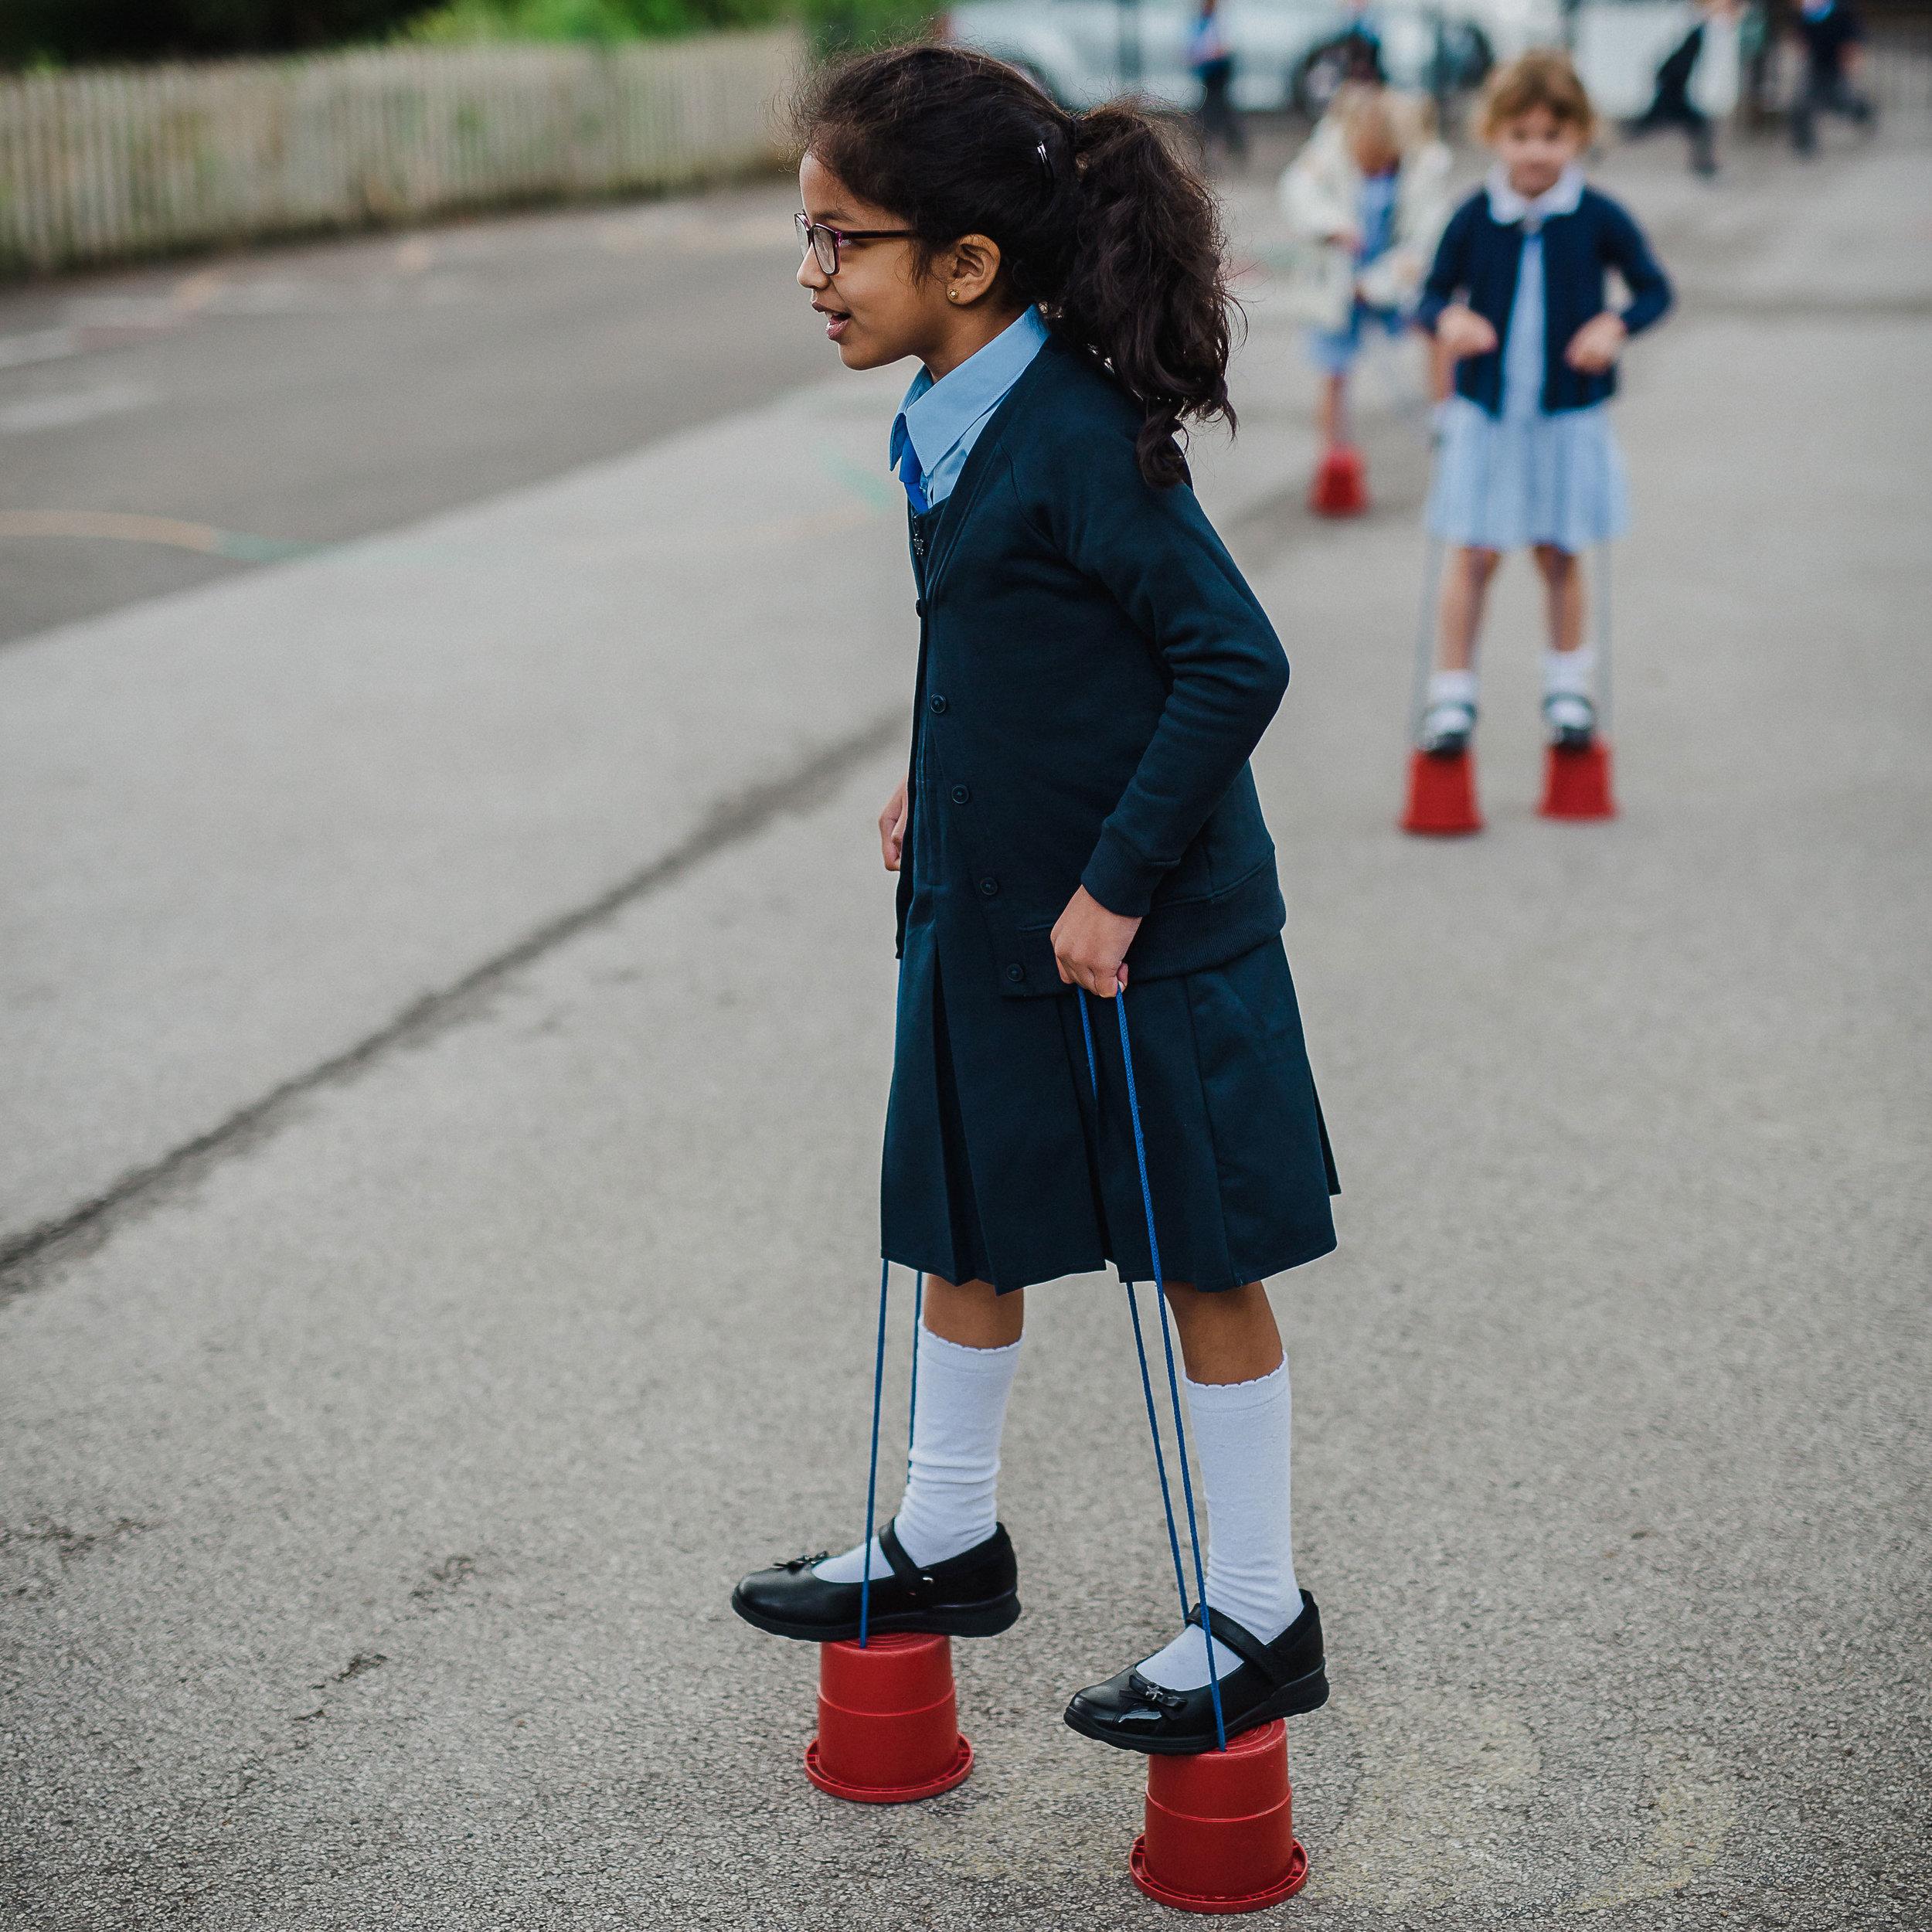 Hessle-Mount-Primary-girls-uniform.jpg